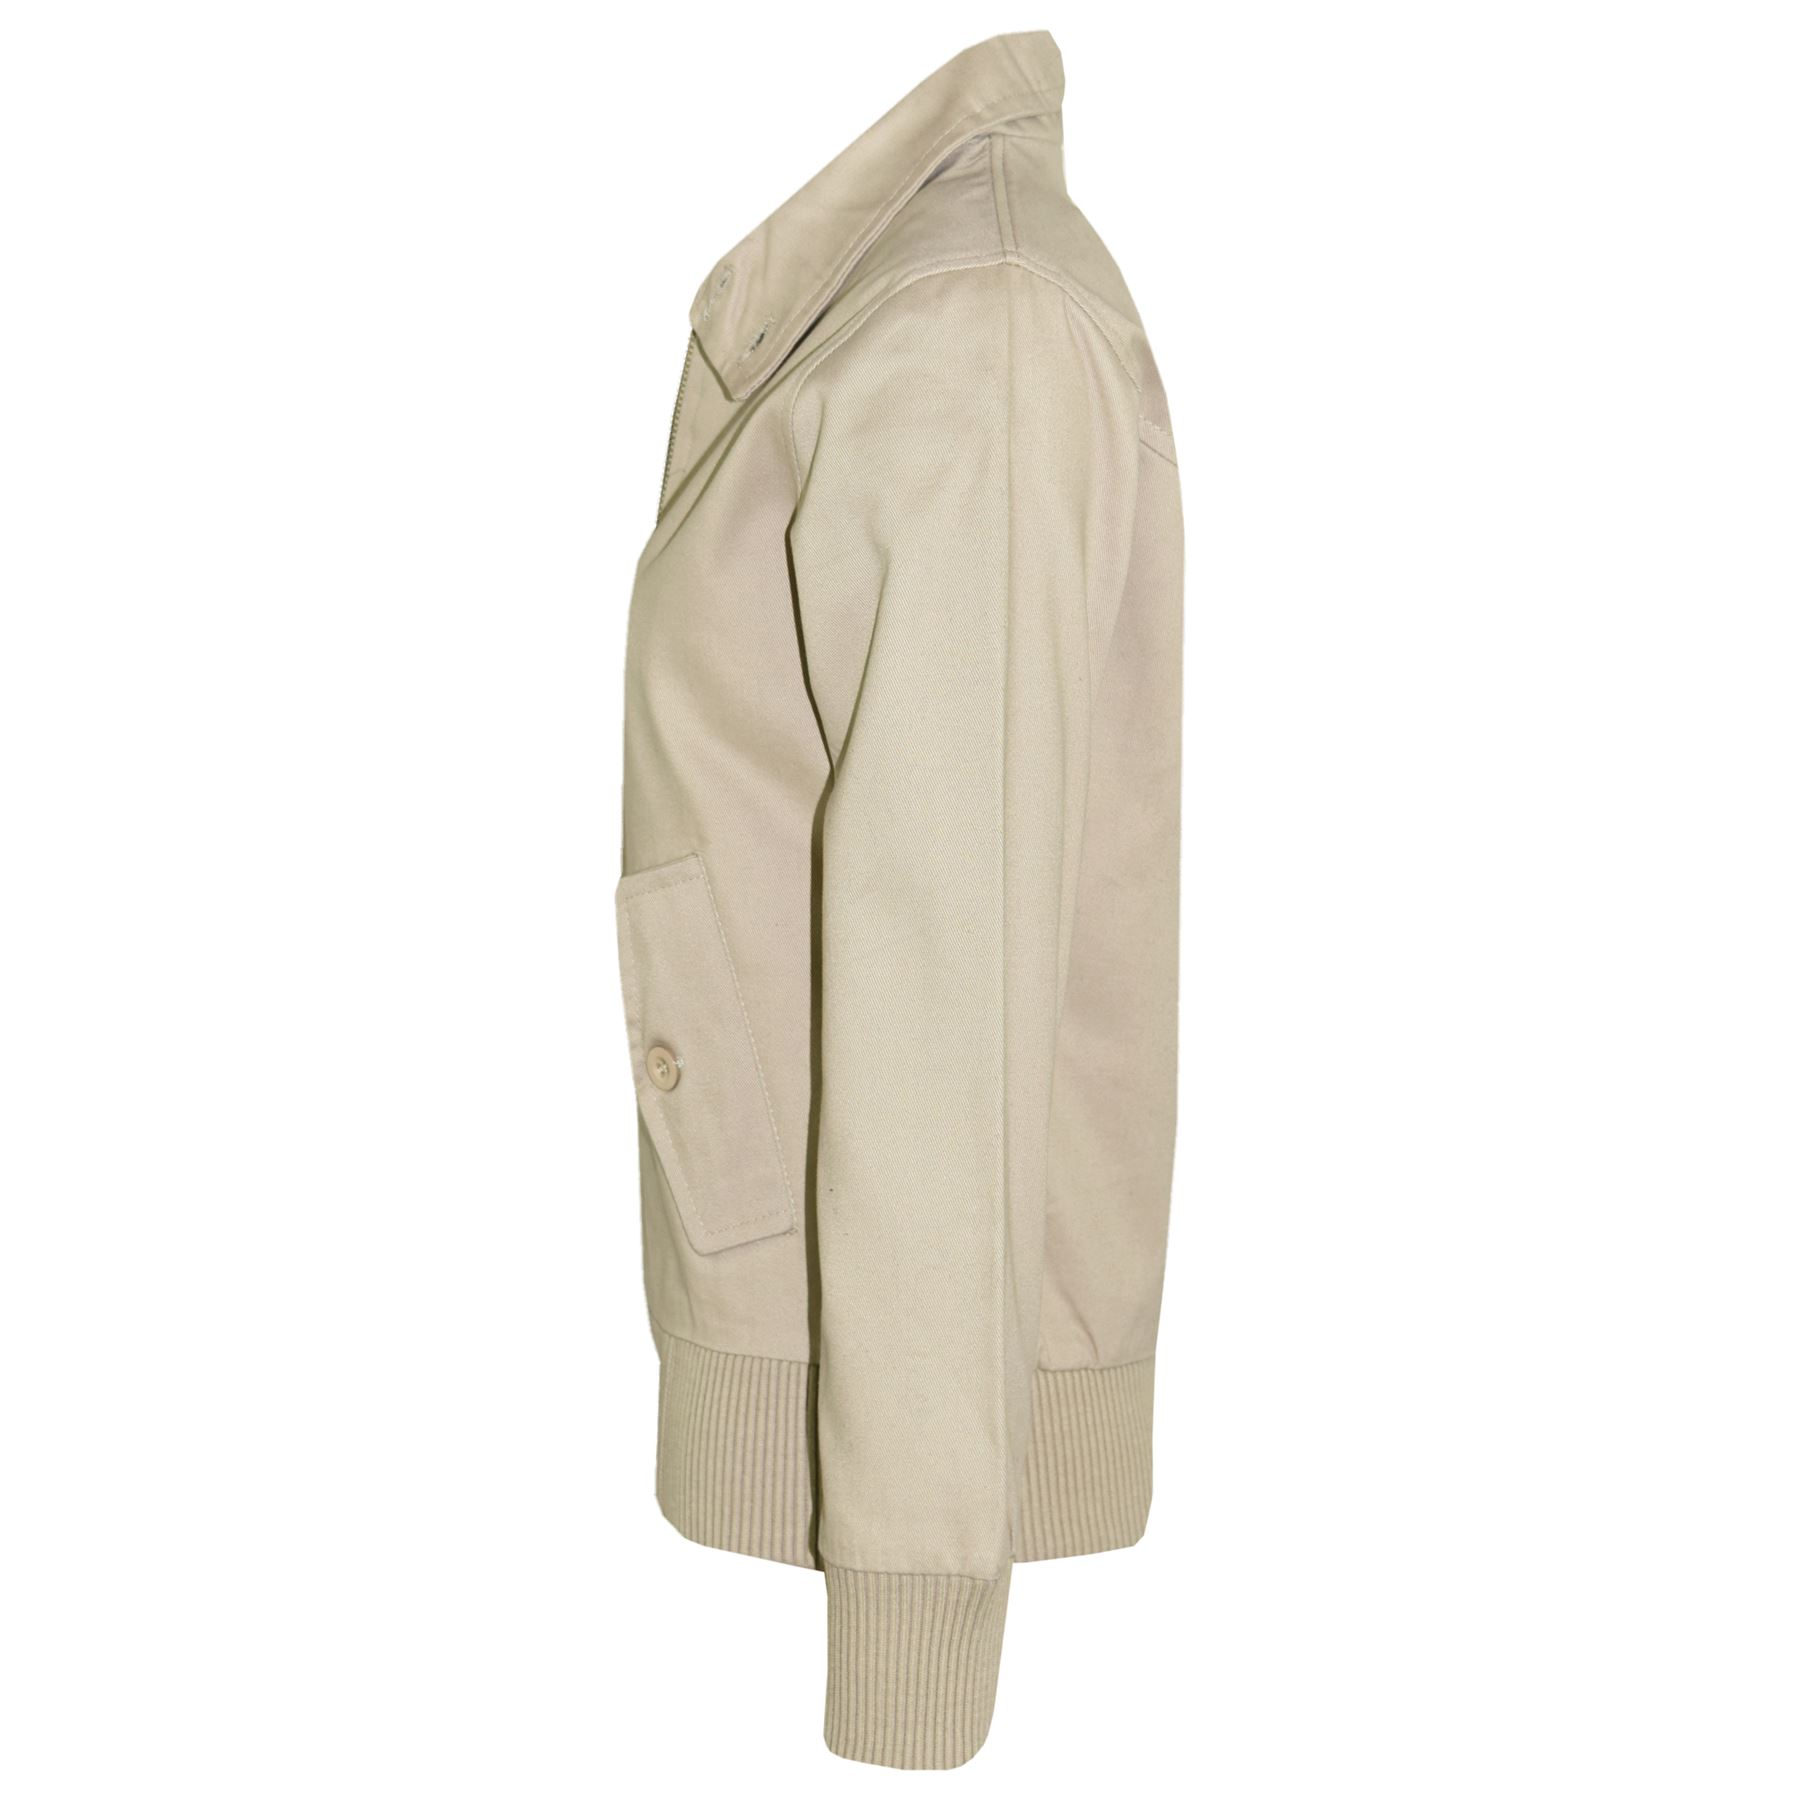 Kids Harrington Jacket Girls Boys New Classic Vintage Retro 1970/'S  Style Coat